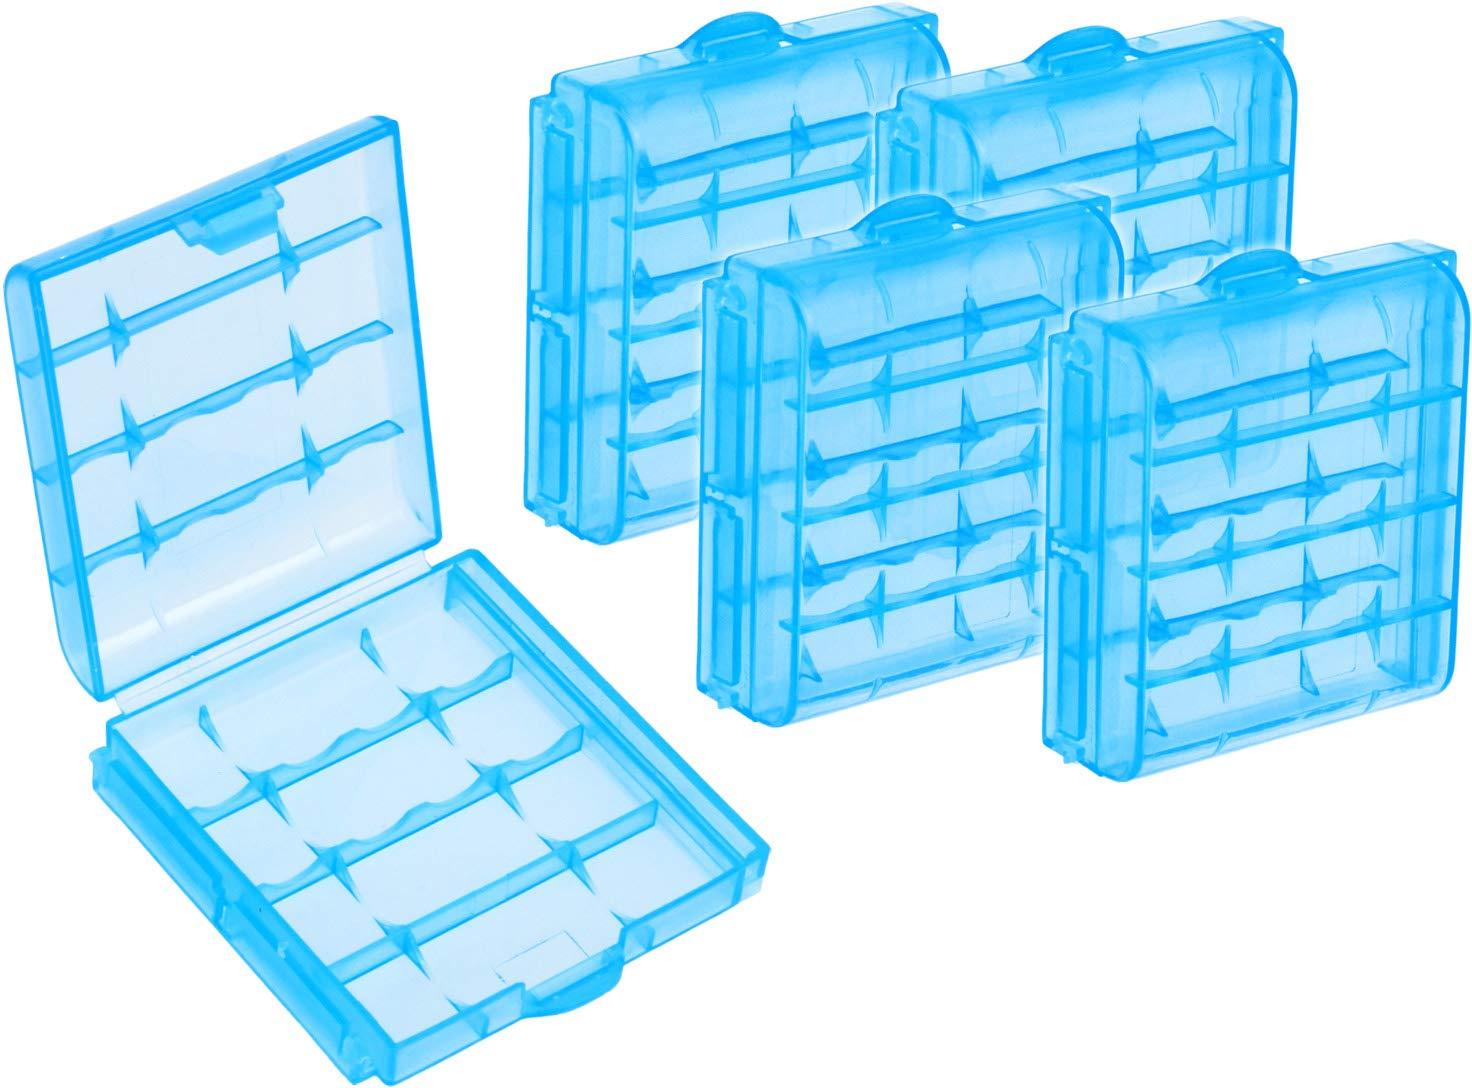 com-four® 5x Caja de batería para baterías AA y AAA Estuche de almacenamiento